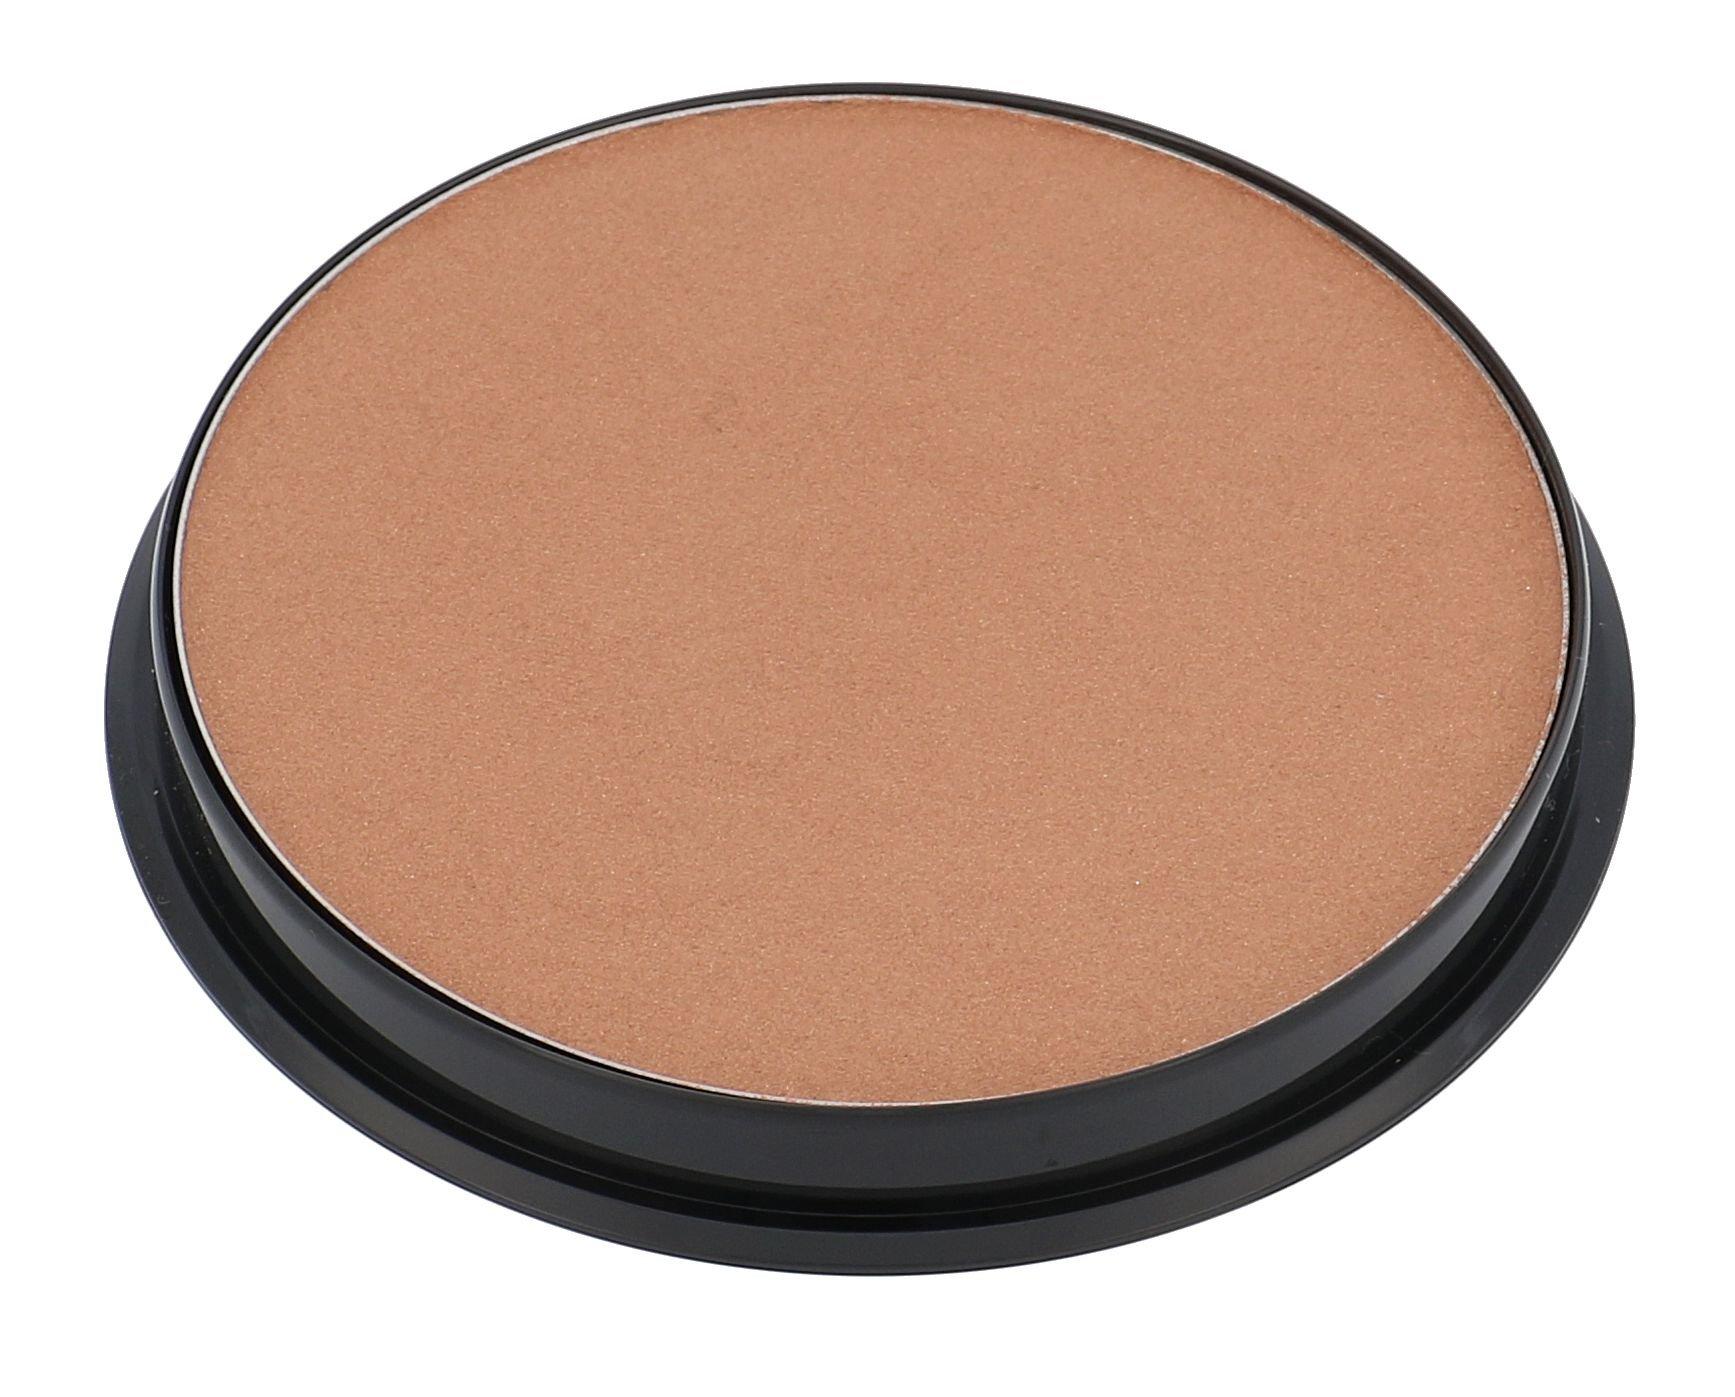 Max Factor Bronzing Powder Cosmetic 21ml 01 Golden